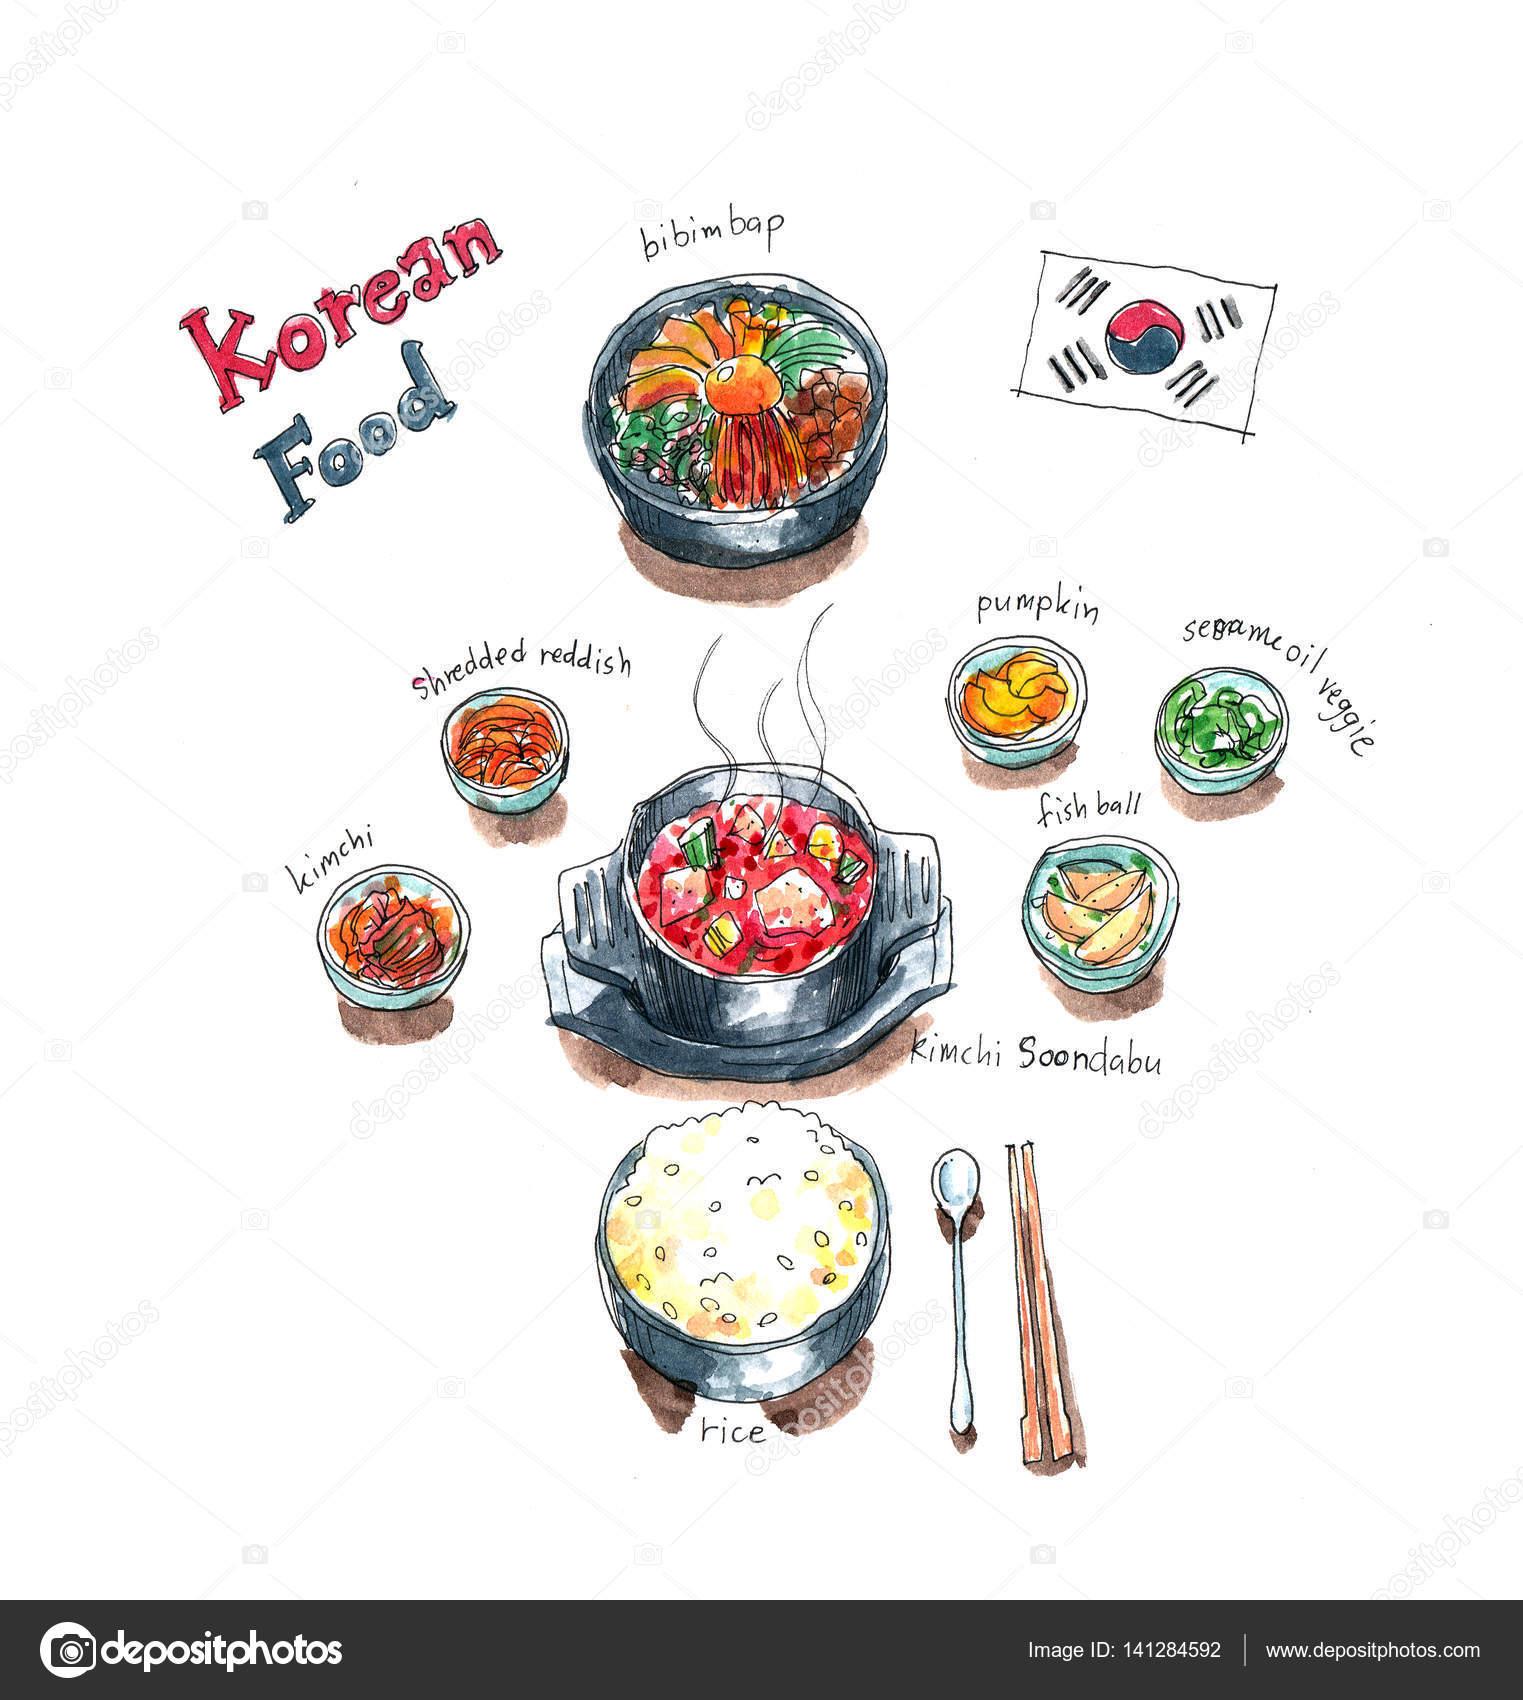 Korean Food Watercolor Korean Food Set Doodle Kimchi Soup Bibimbap And Side Dishes Watercolor Painting Stock Photo C Glowonconcept 141284592